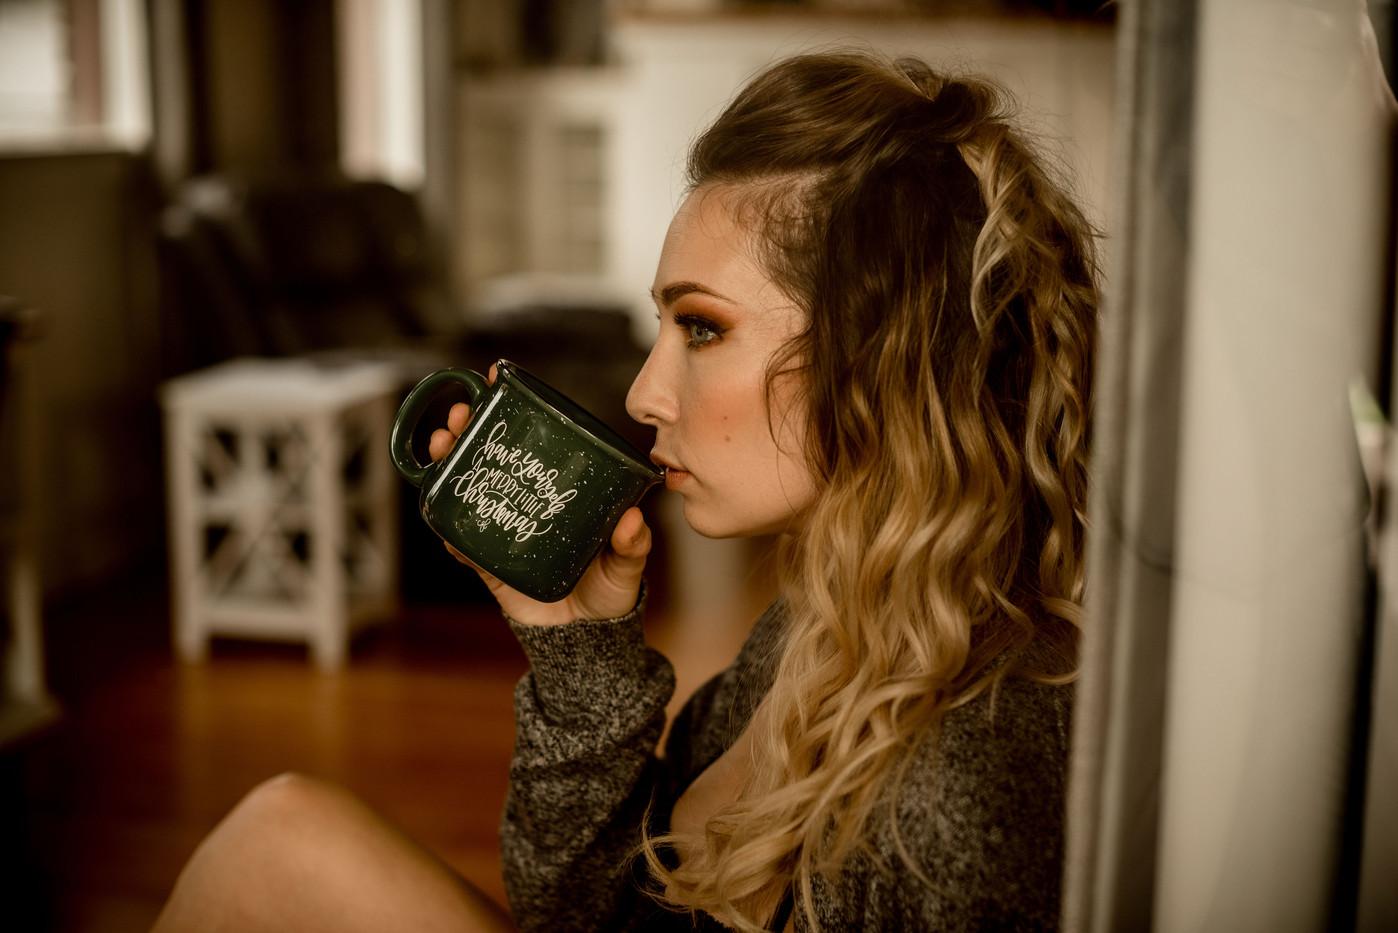 Photo: Rebecca Tulloch | Makeup: Natasha Gendron| Model: Sarah | Hair: Areca Hollinsworth